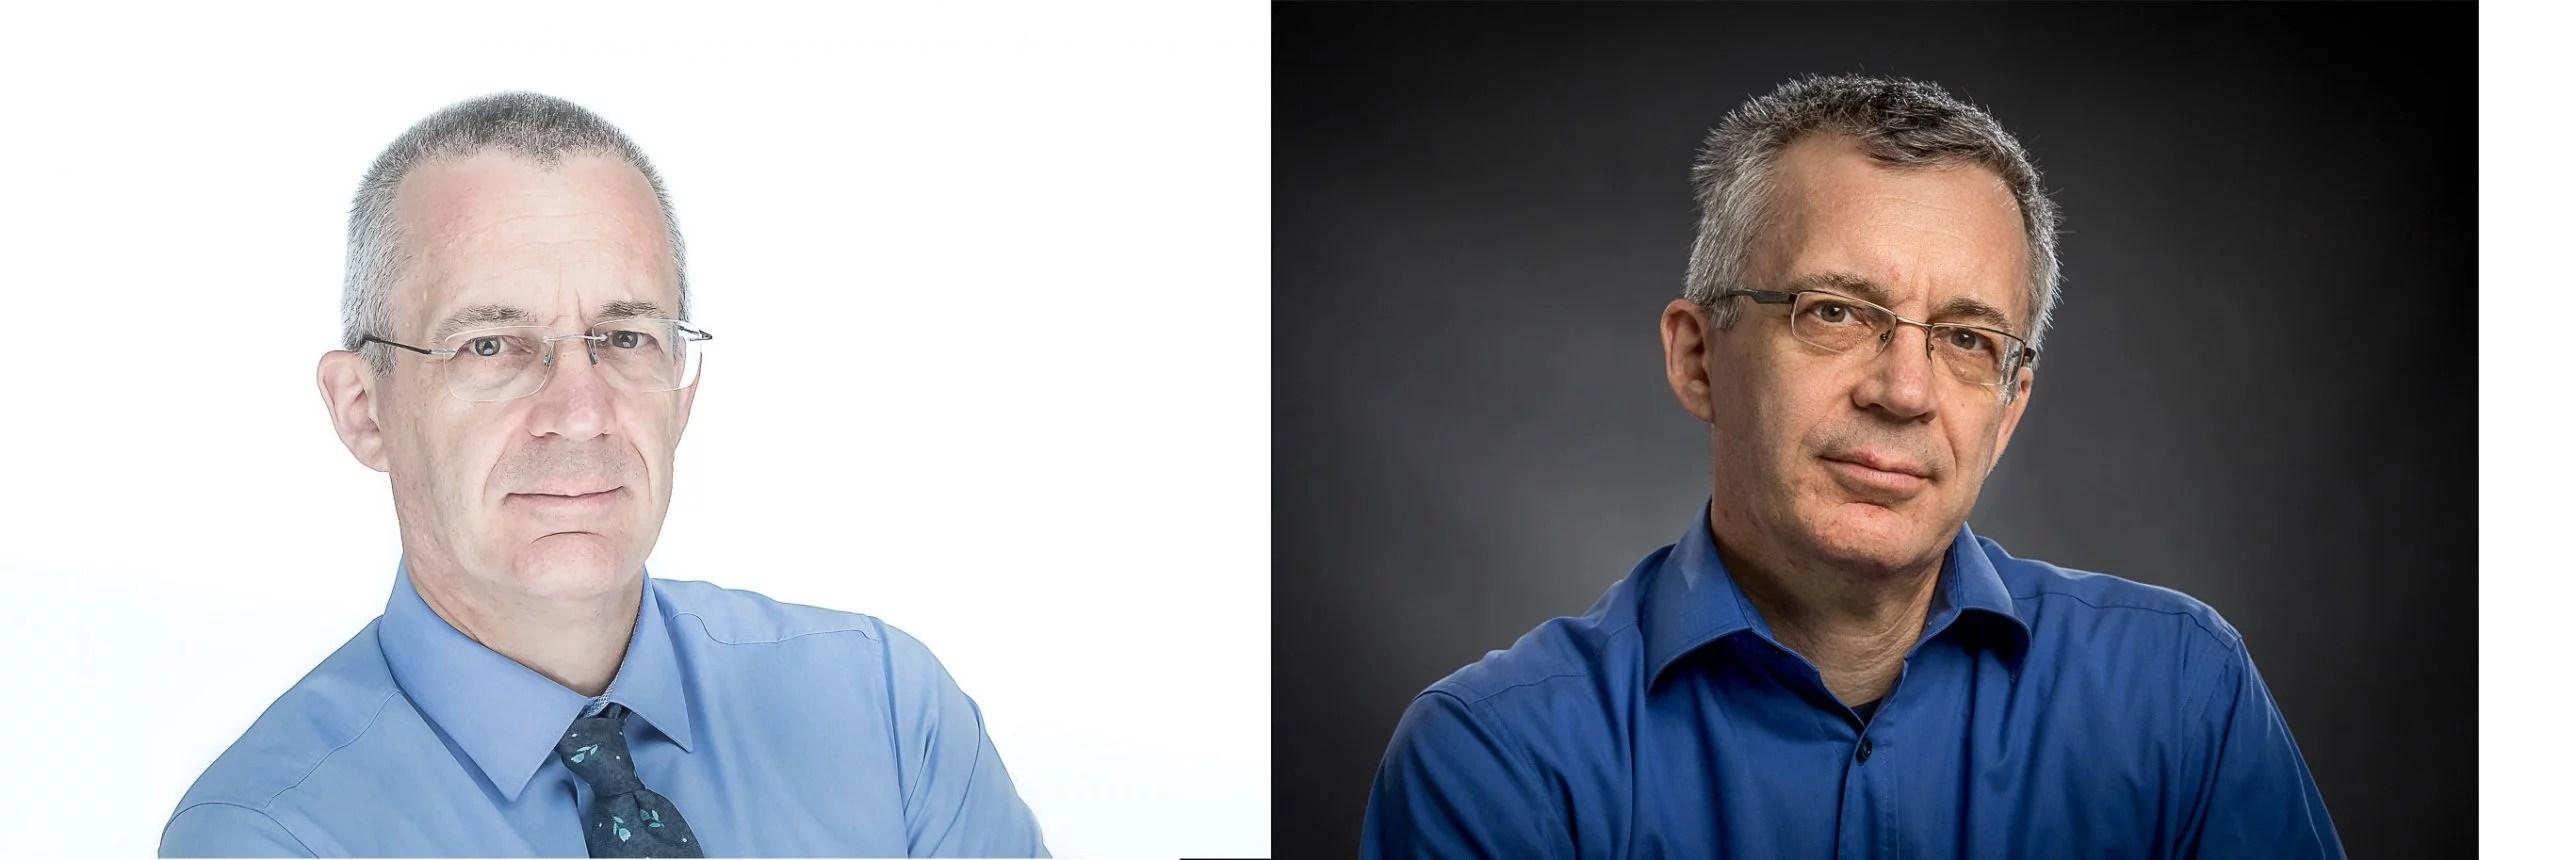 Business-Portraits mit verschiedener Anmutung (Look) - hell oder dunkel.